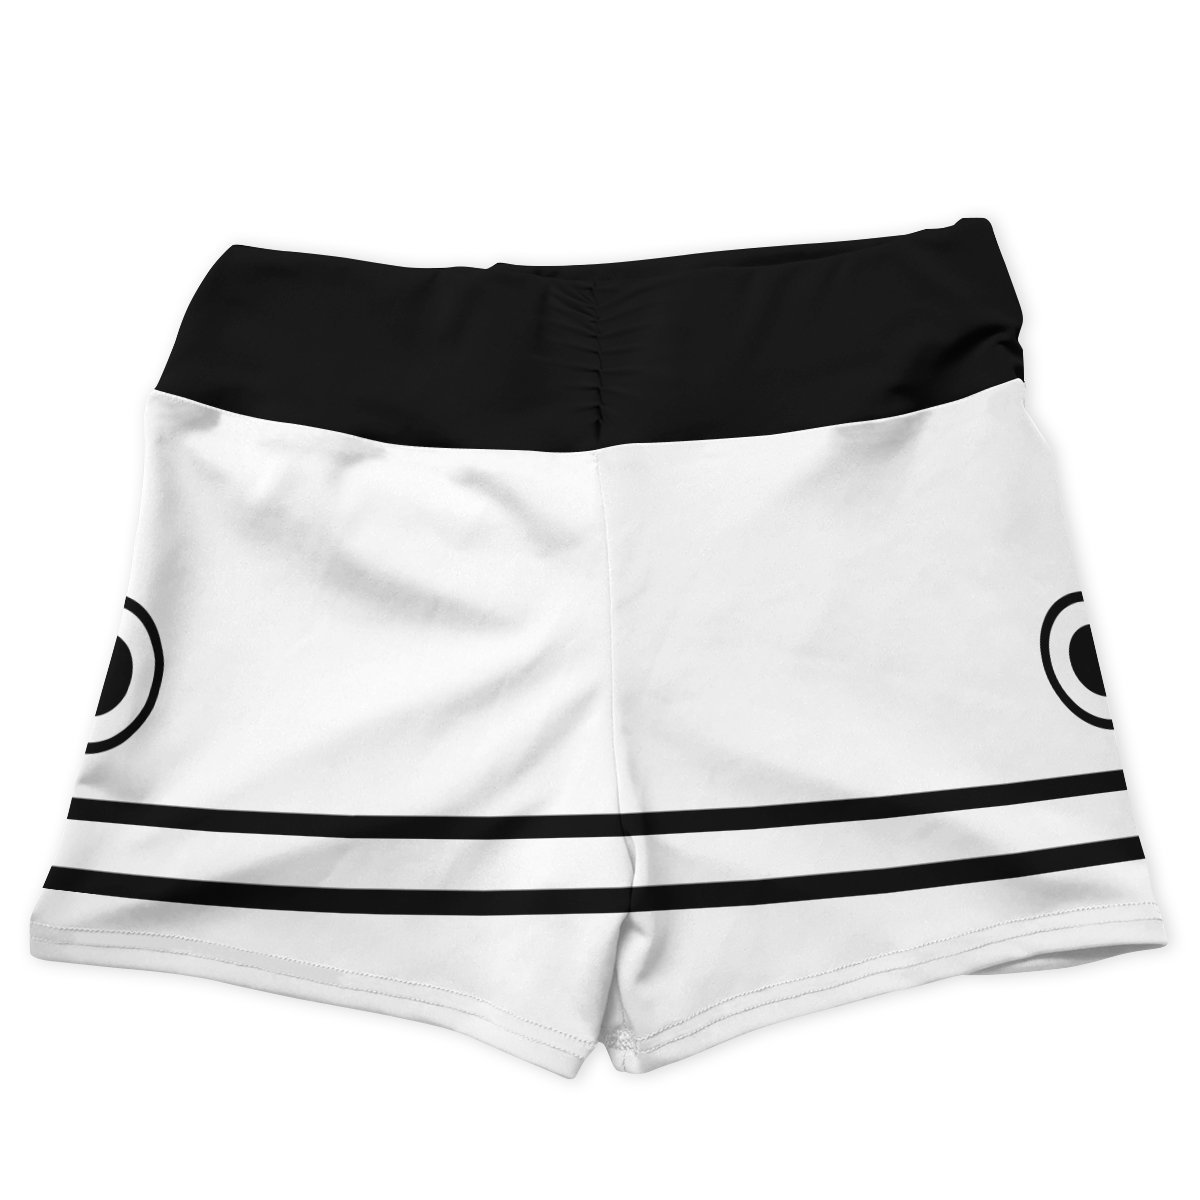 sukuna active wear set 915817 - Anime Swimsuits